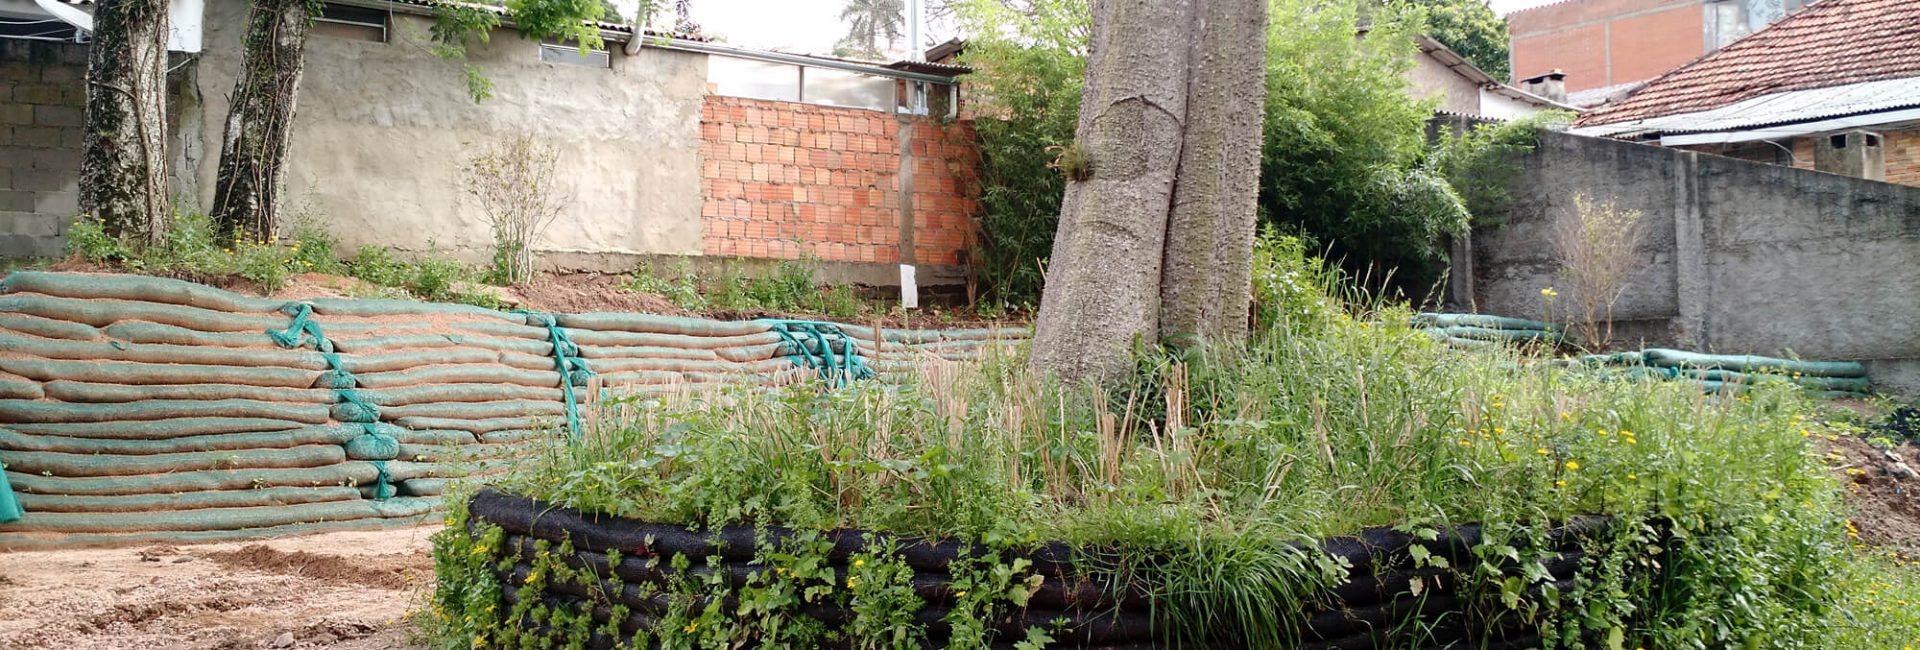 muro de contencao vegetado